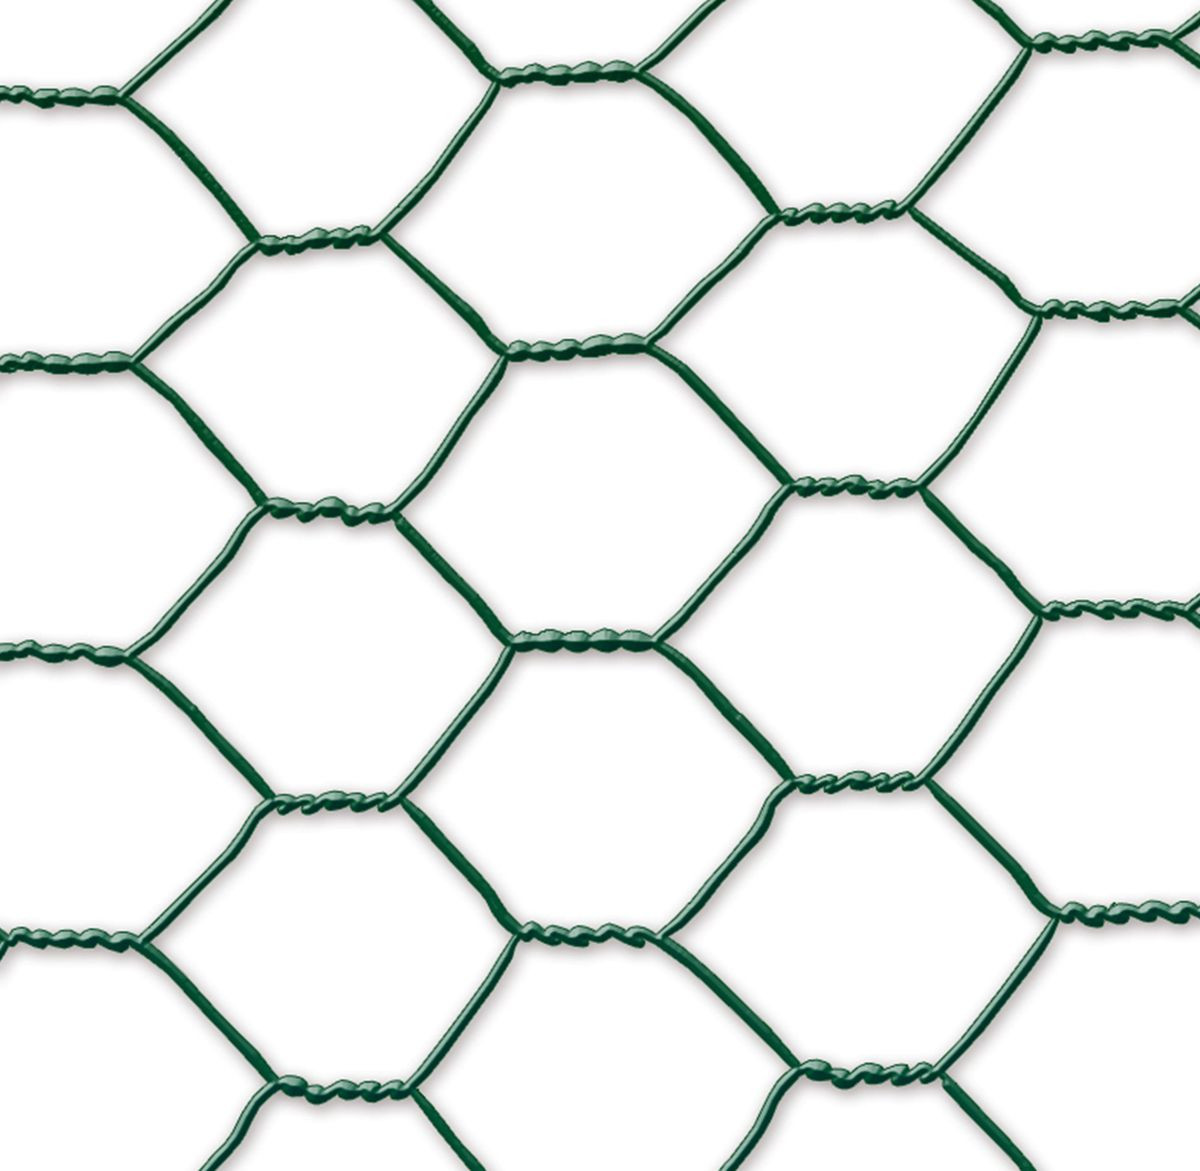 Grillage métal plastifié - 1 x 10 m/13 x 0,7 mm \